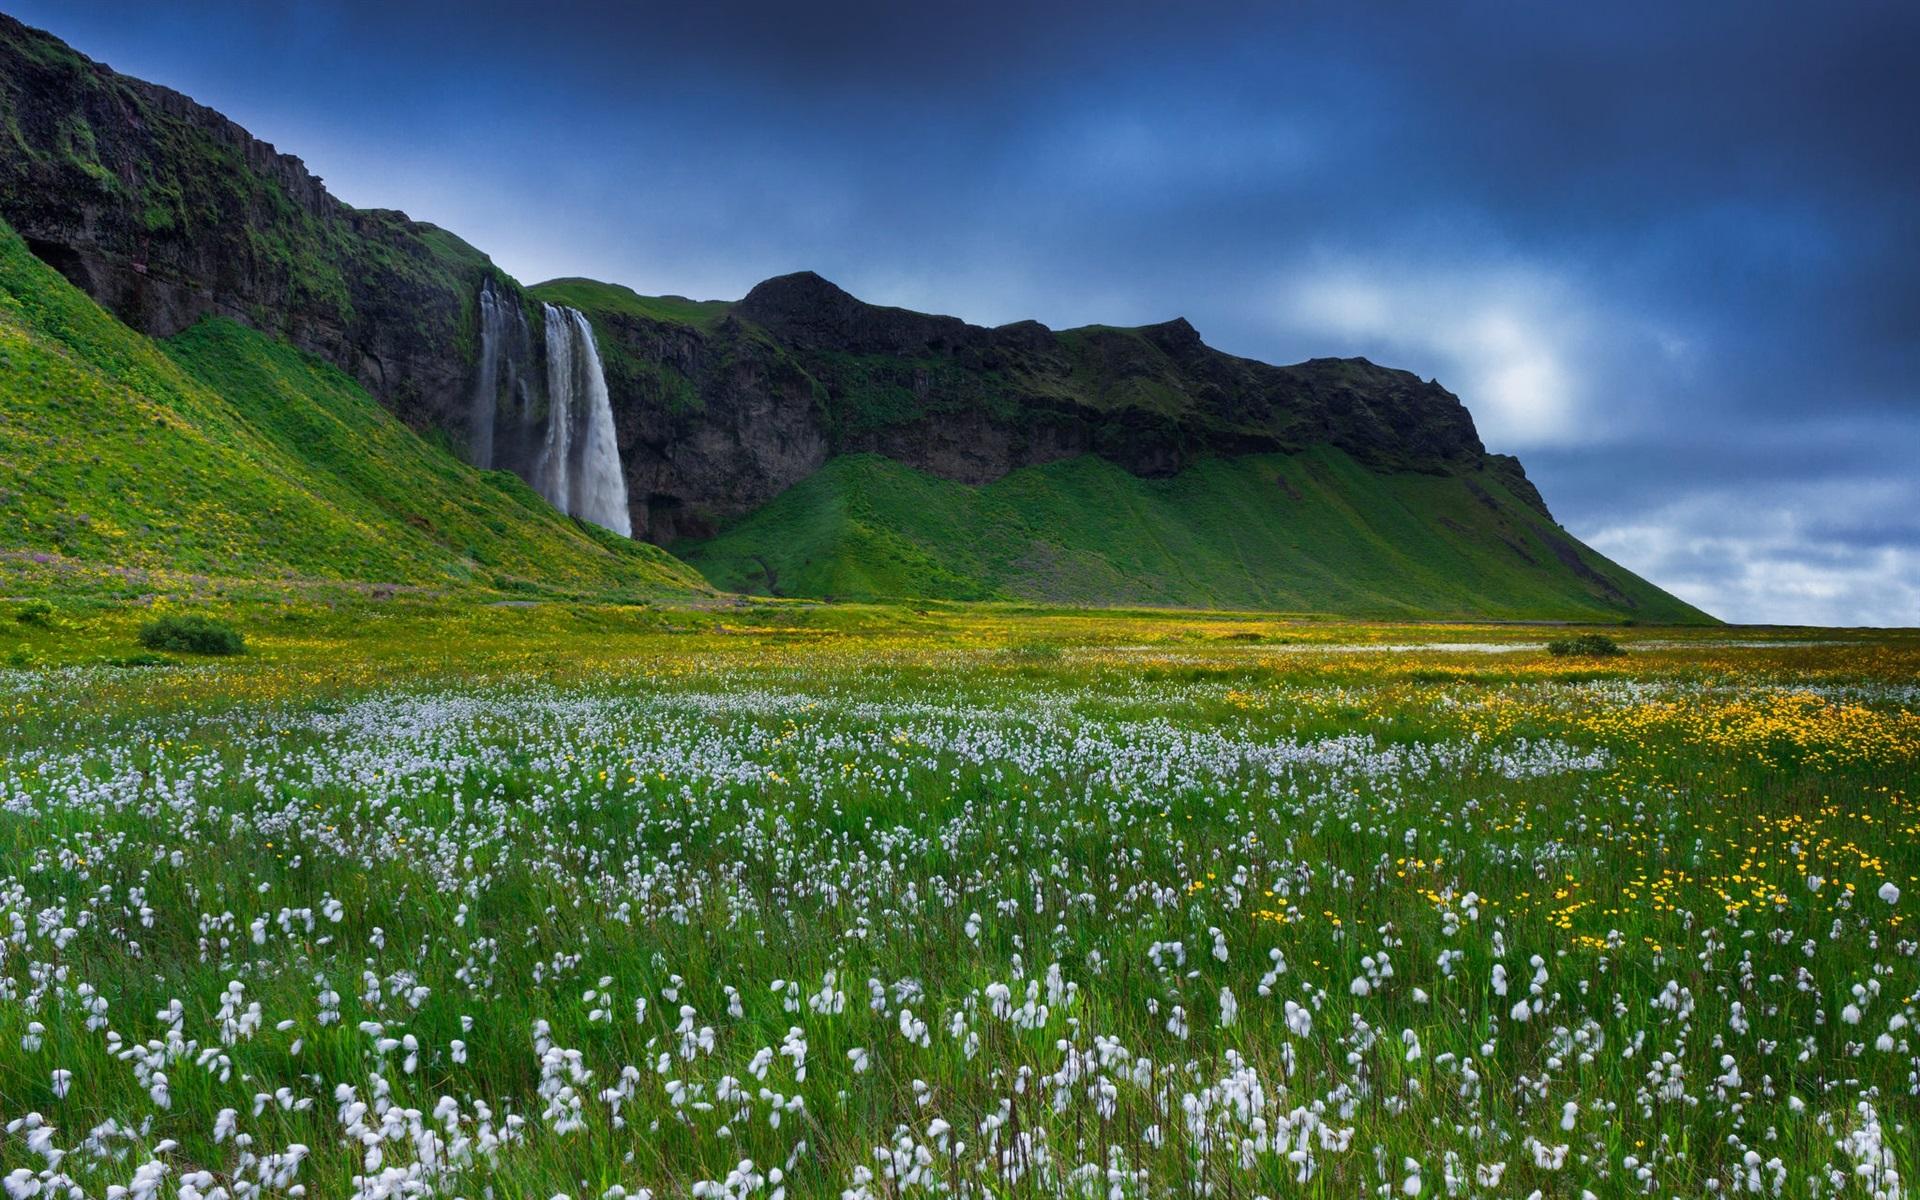 Fondos De Pantalla De Flores Hermosas: Fondos De Pantalla Islandia, Hermosa Cascada, Flores